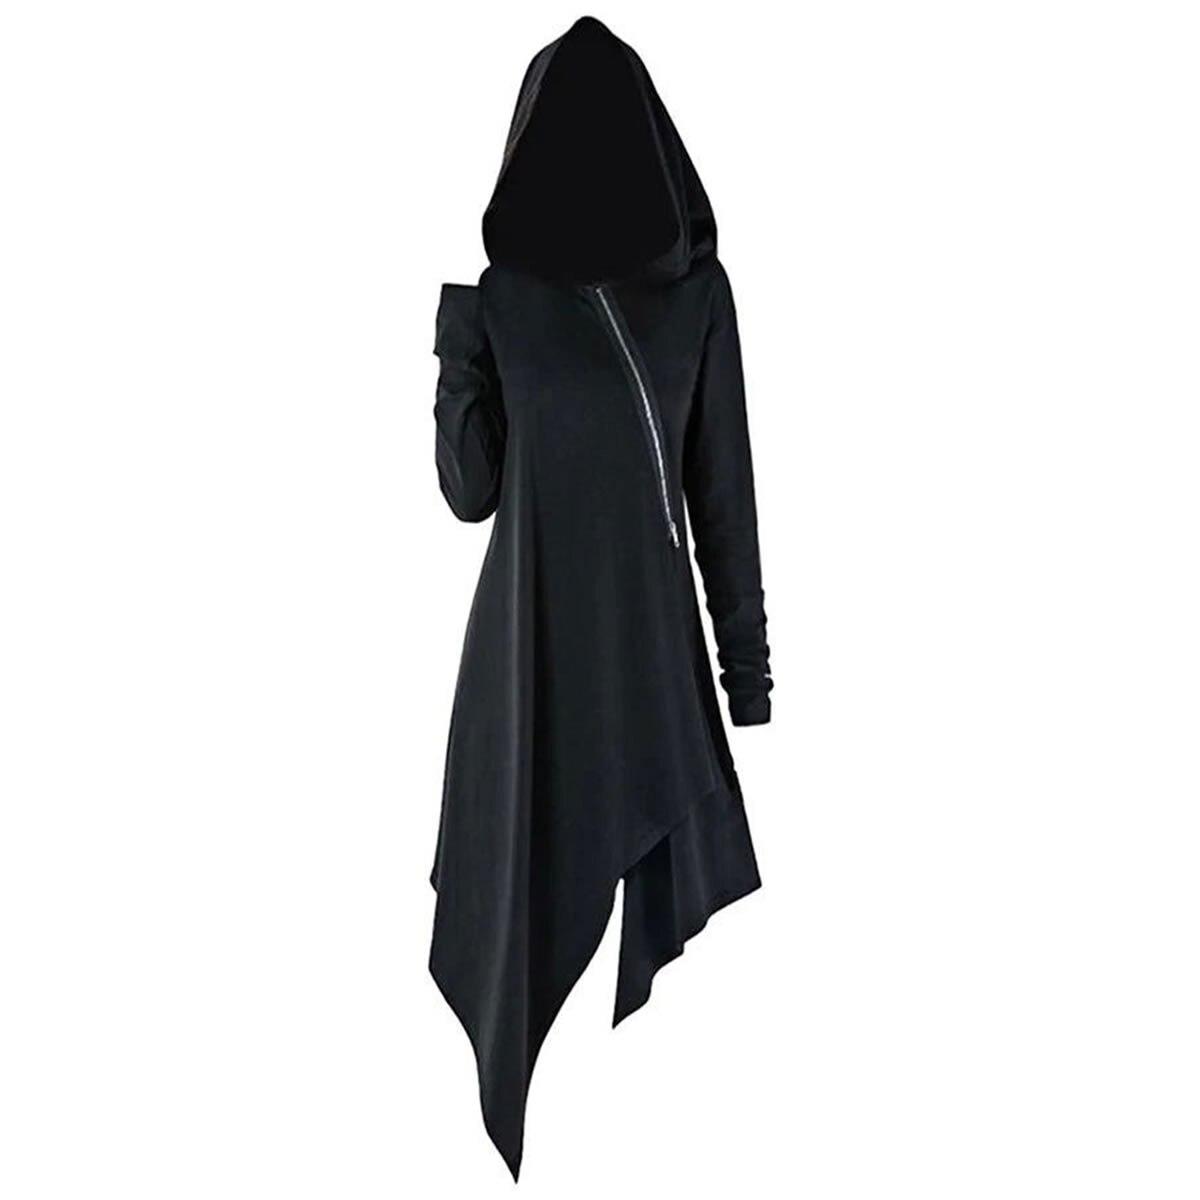 Fashion Long Sleeve Hooded Trench Coat 2019 Autumn Black Zipper Plus Size XL Velvet Long Coat Women Overcoat Clothes